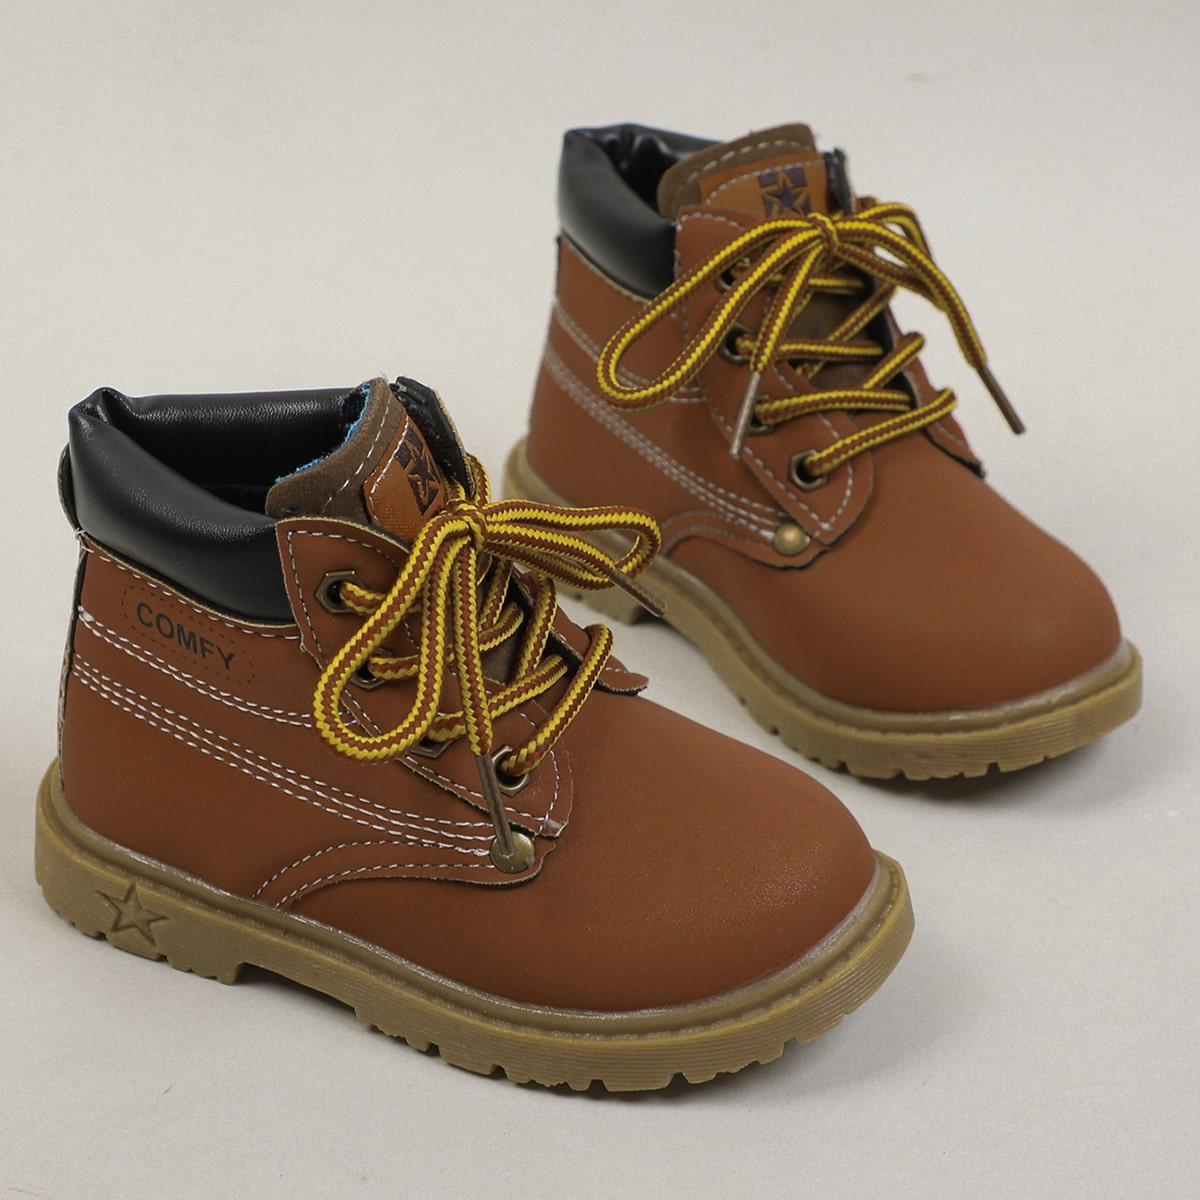 Ботинки на шнурке для мальчиков SheIn sk2108055866591527